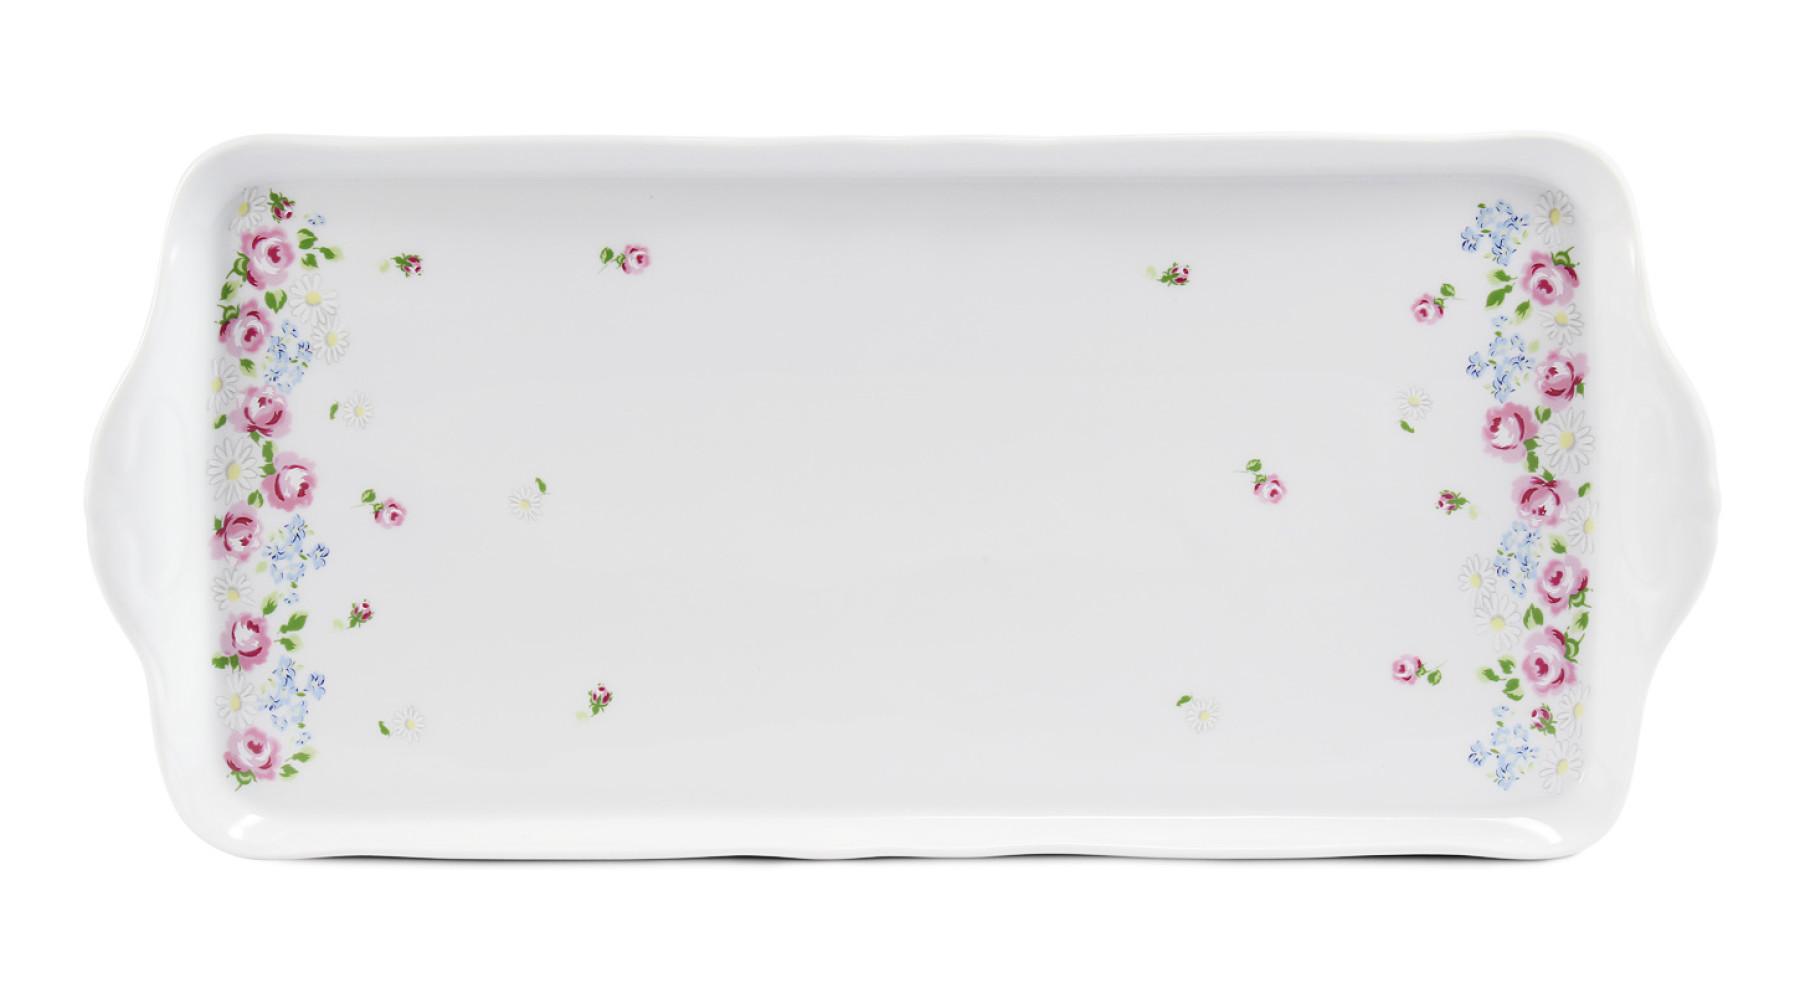 Servierbrett Quadrat 36 cm RoseLine